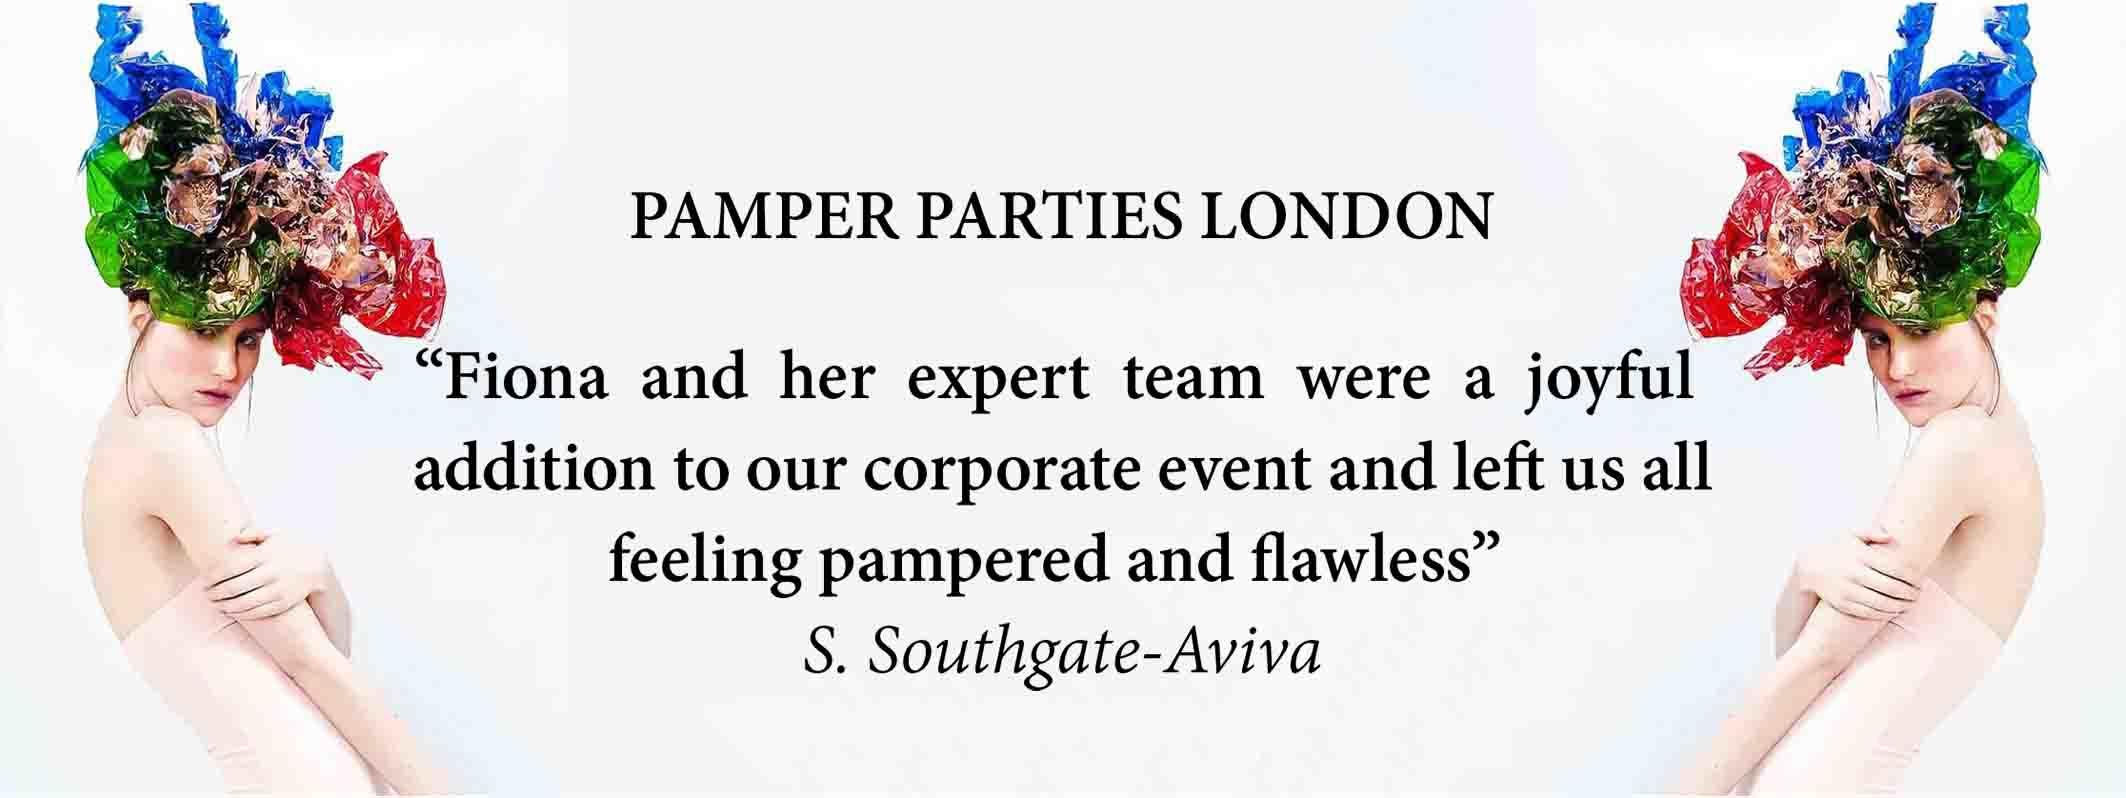 PAMPER PARTIES IN SOUTH EAST LONDON AT FTMAKEUP SPLASH